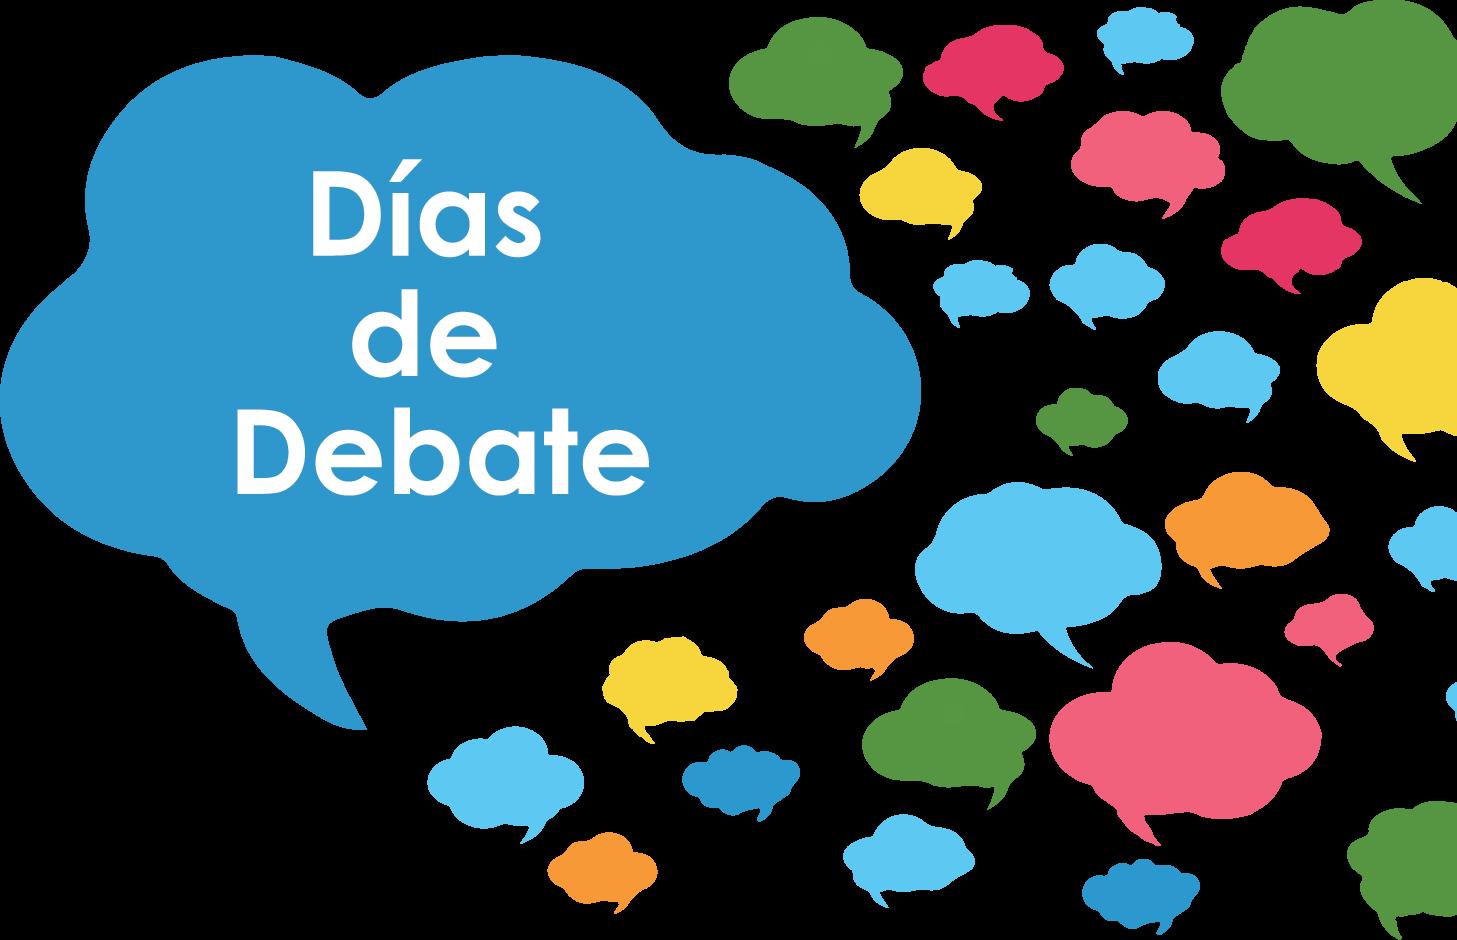 Días de Debate 2016